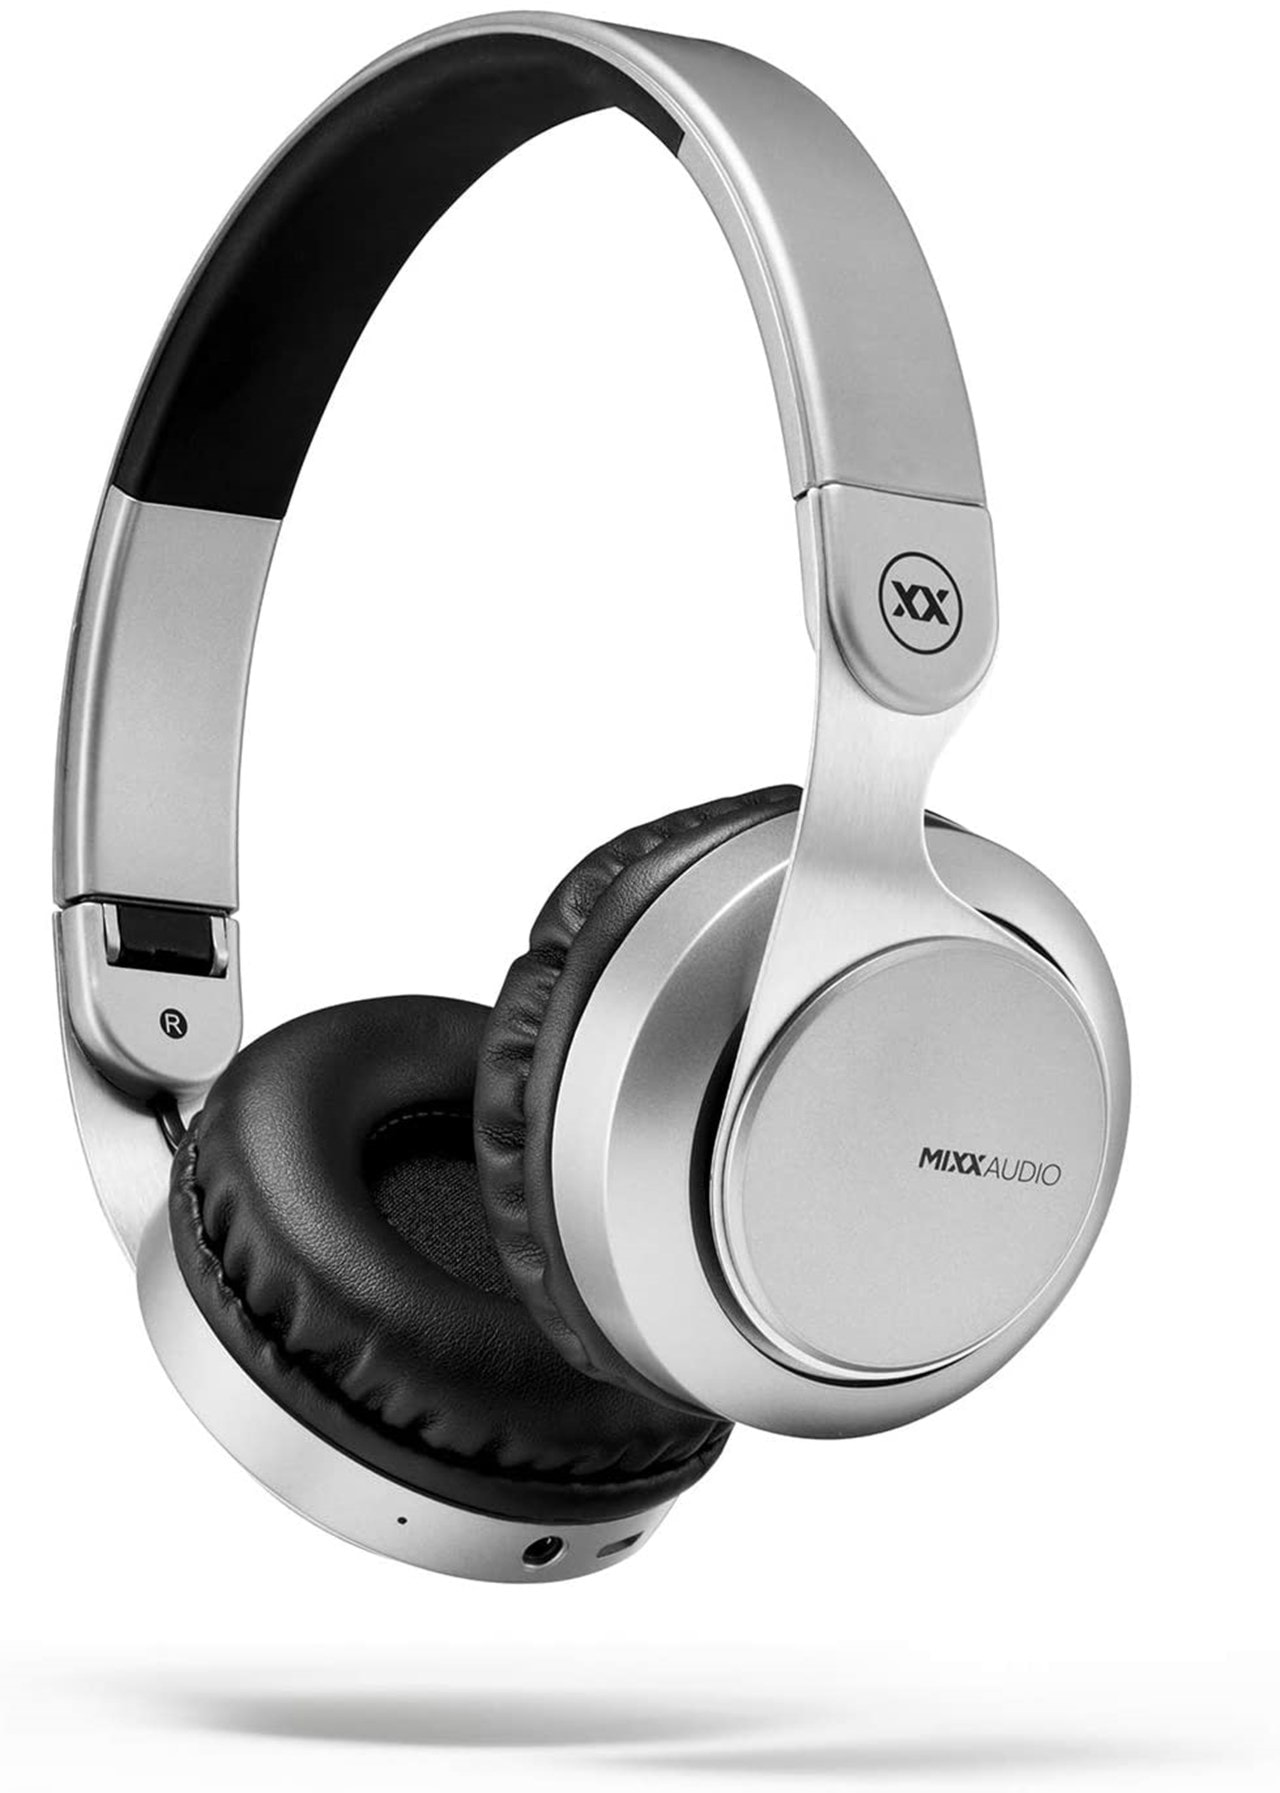 Mixx Audio JX1 Space Grey On Ear Bluetooth Headphones - 1